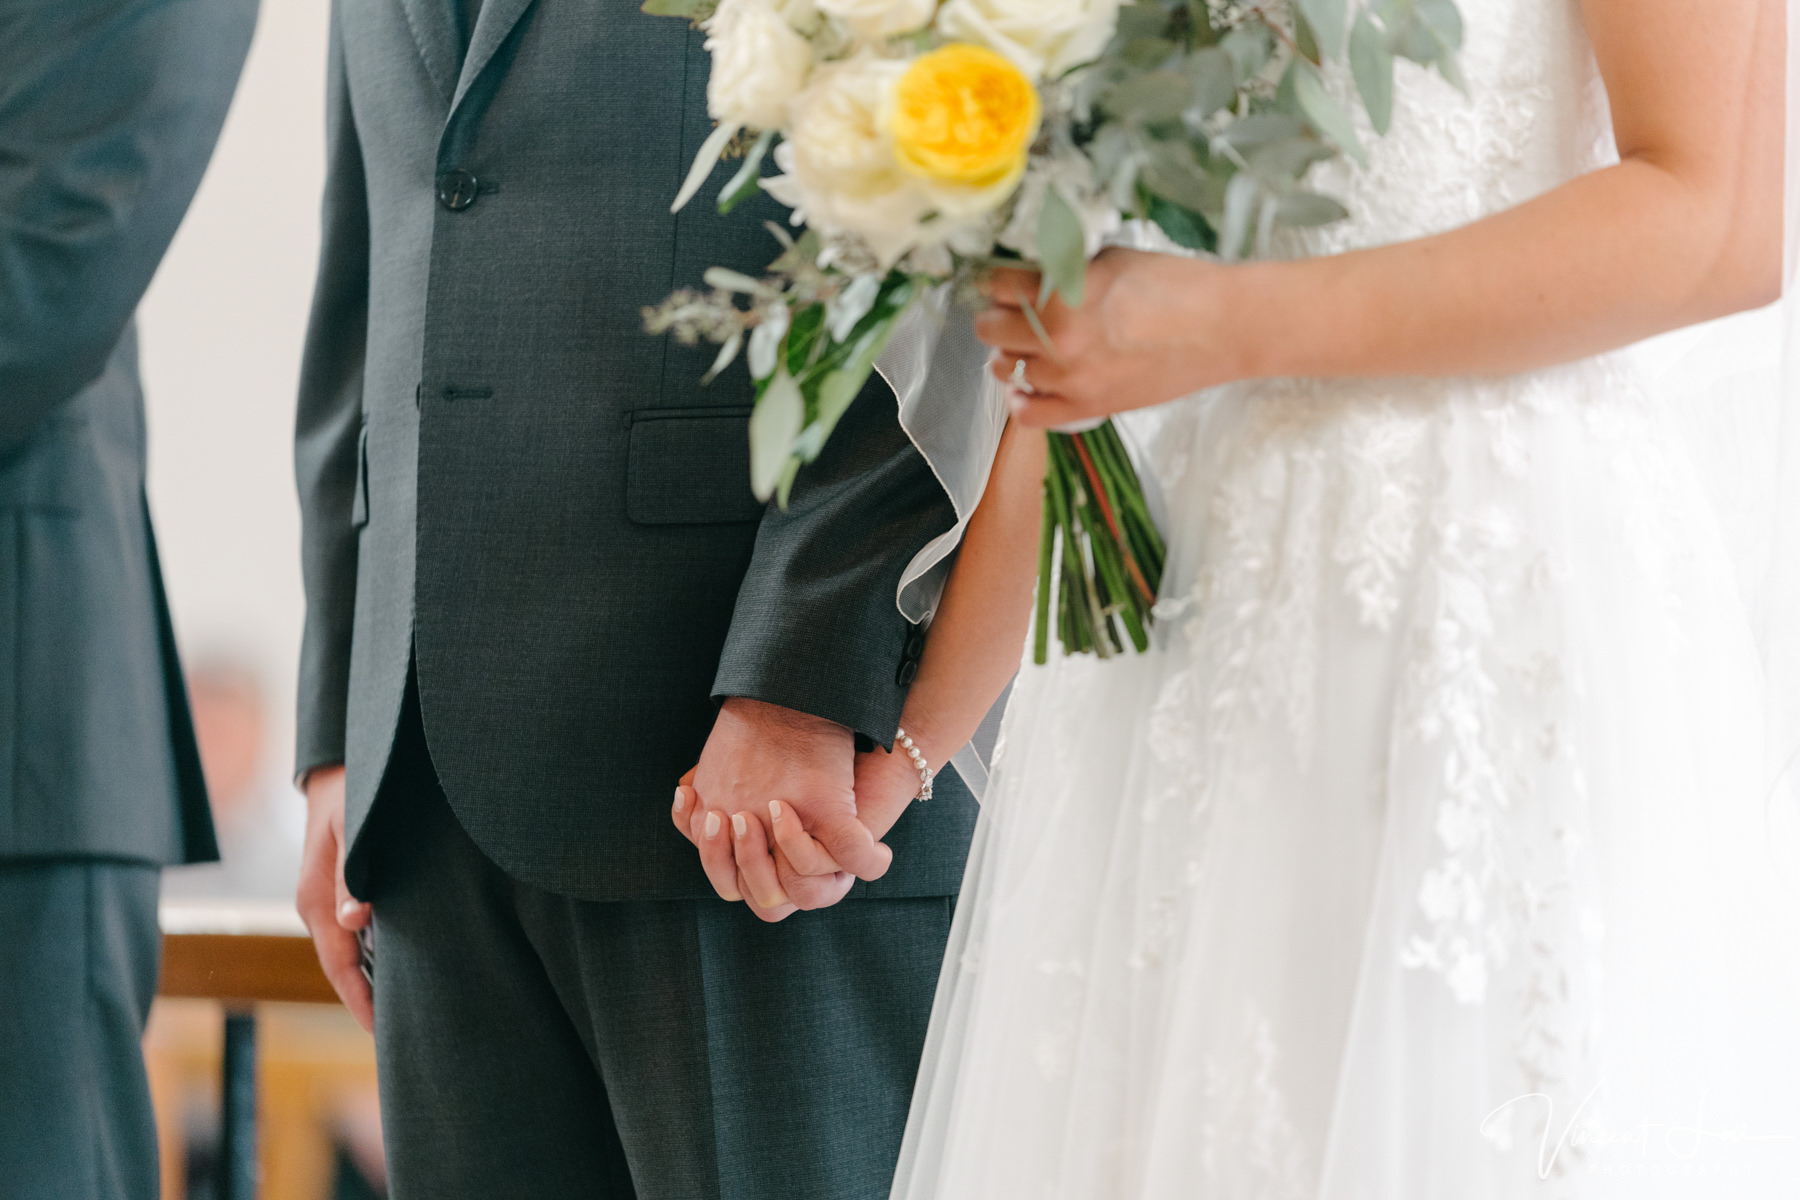 Wedding at St Nicholas Greek Orthodox Church and Sergeants Mess Reception